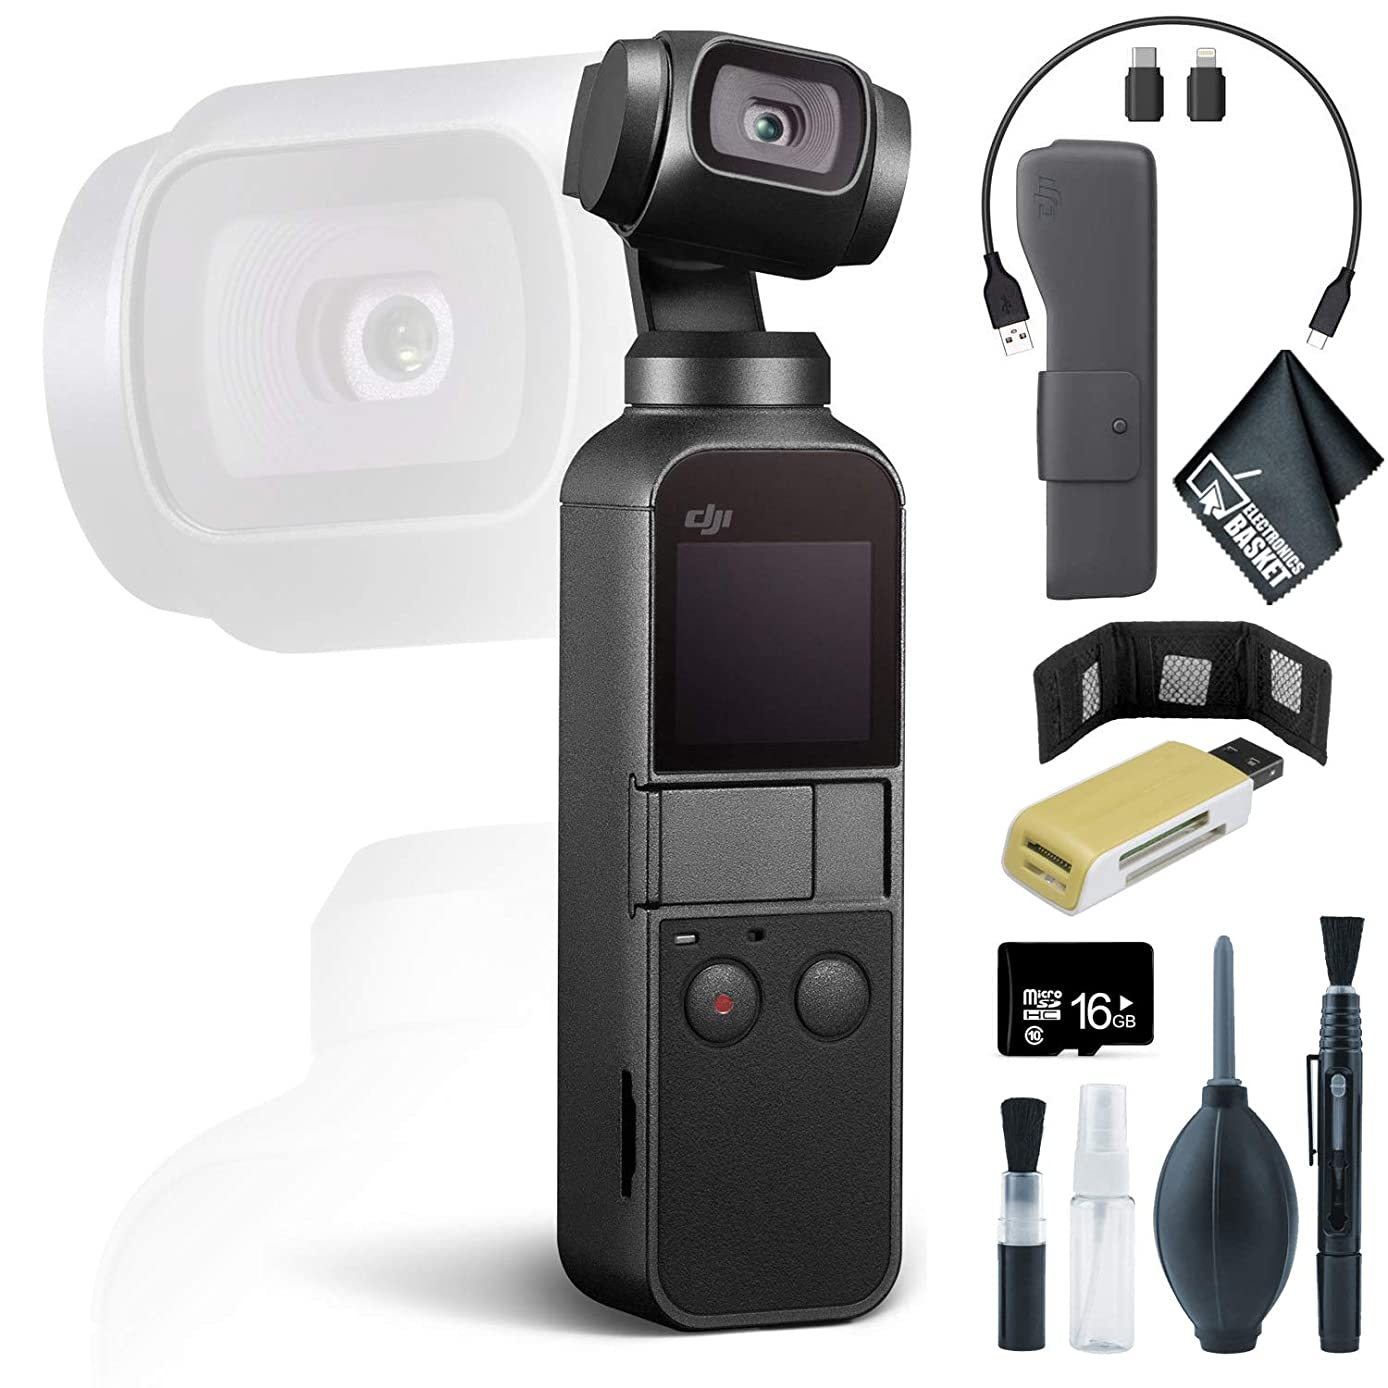 DJI Osmo Pocket Gimbal + Memory Card Wallet + USB Card Reader, SD/microSD + 16GB microSD Memory Card and More